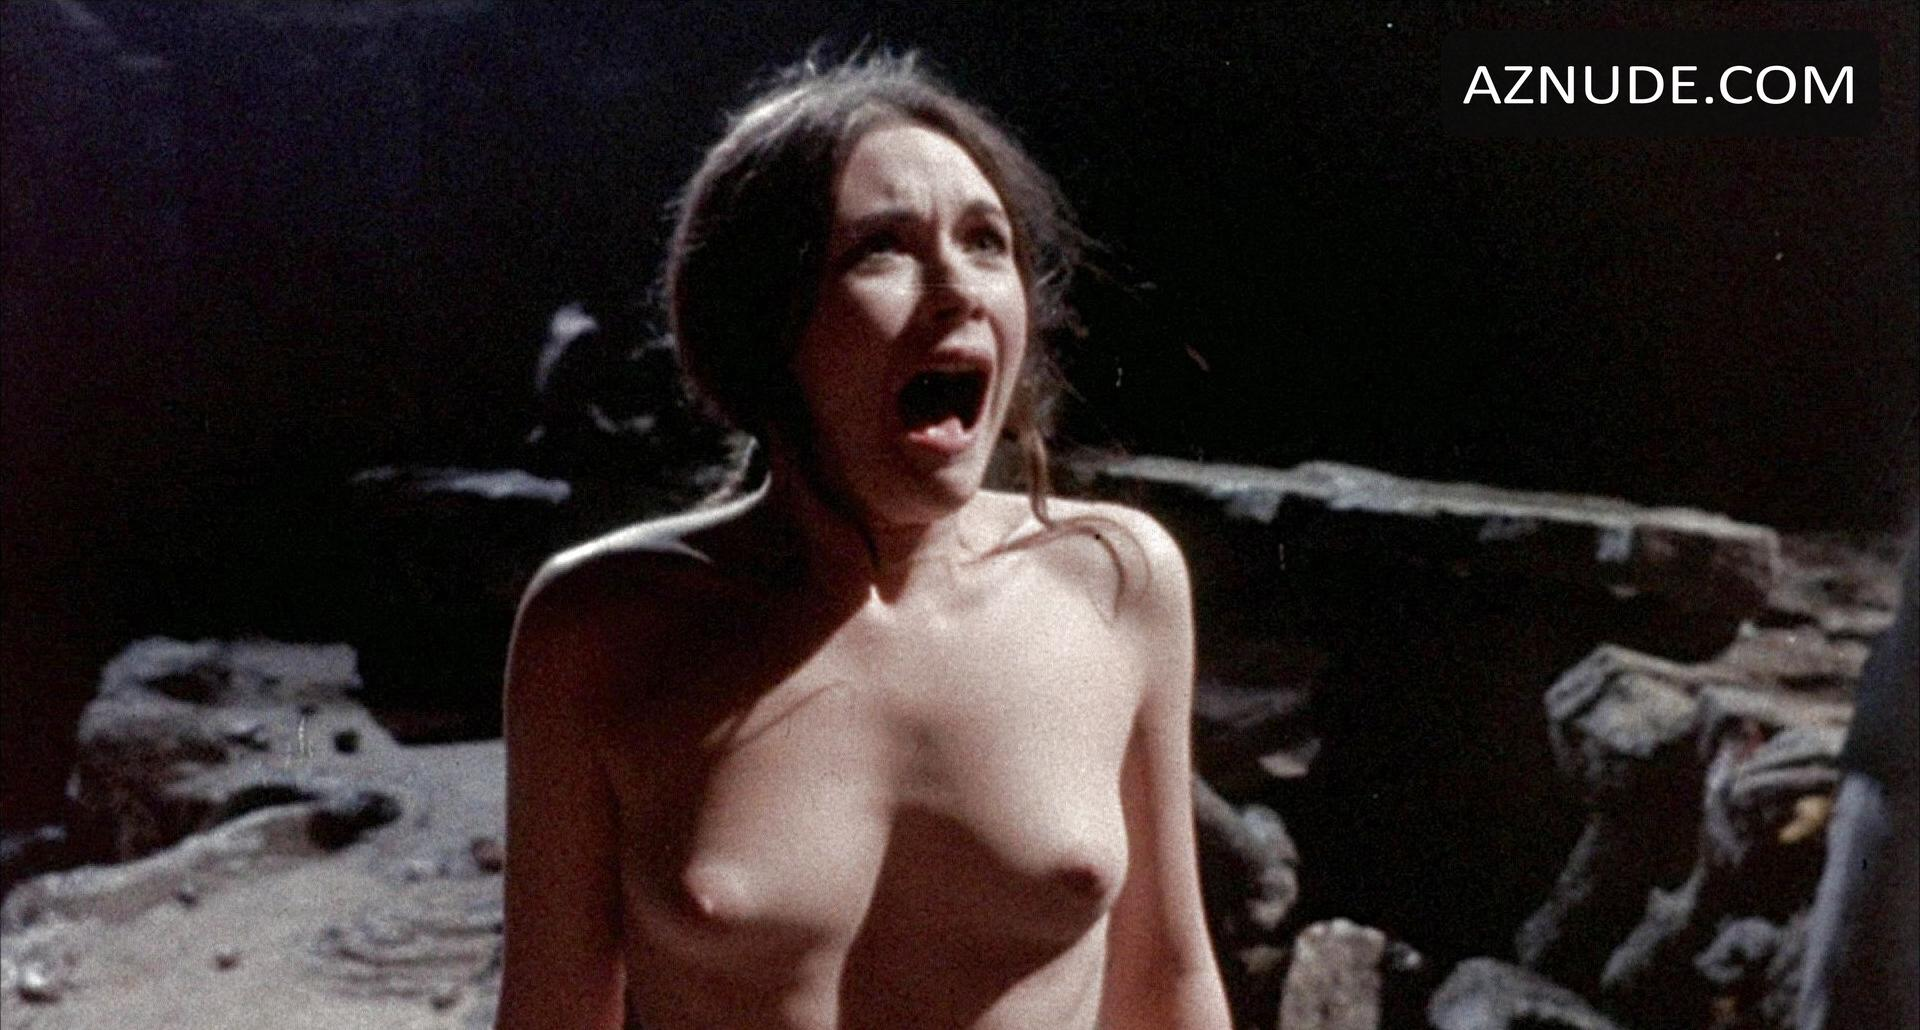 Nude pics from demonic